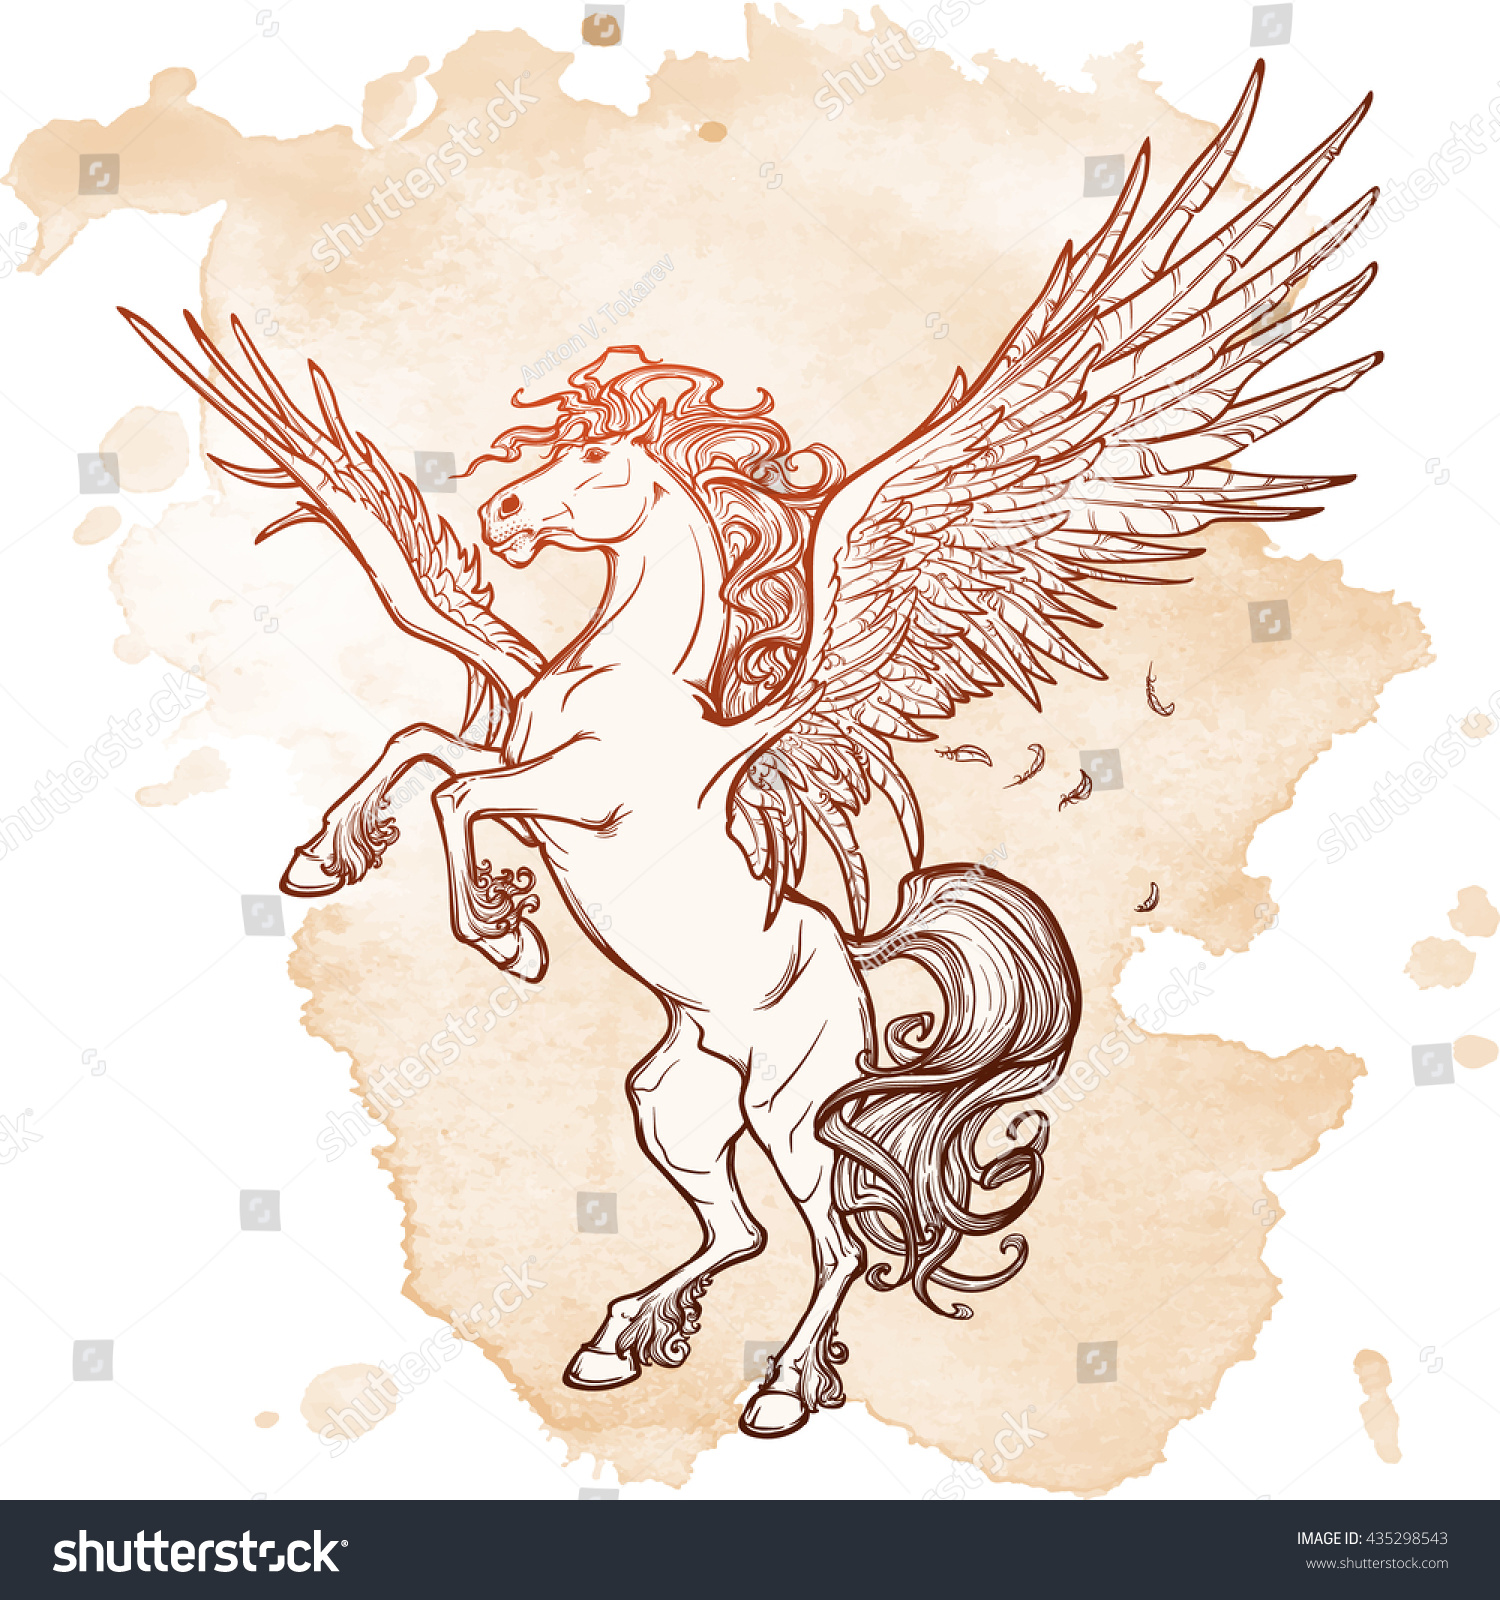 pegasus greek mythological creature legendary beast stock vector